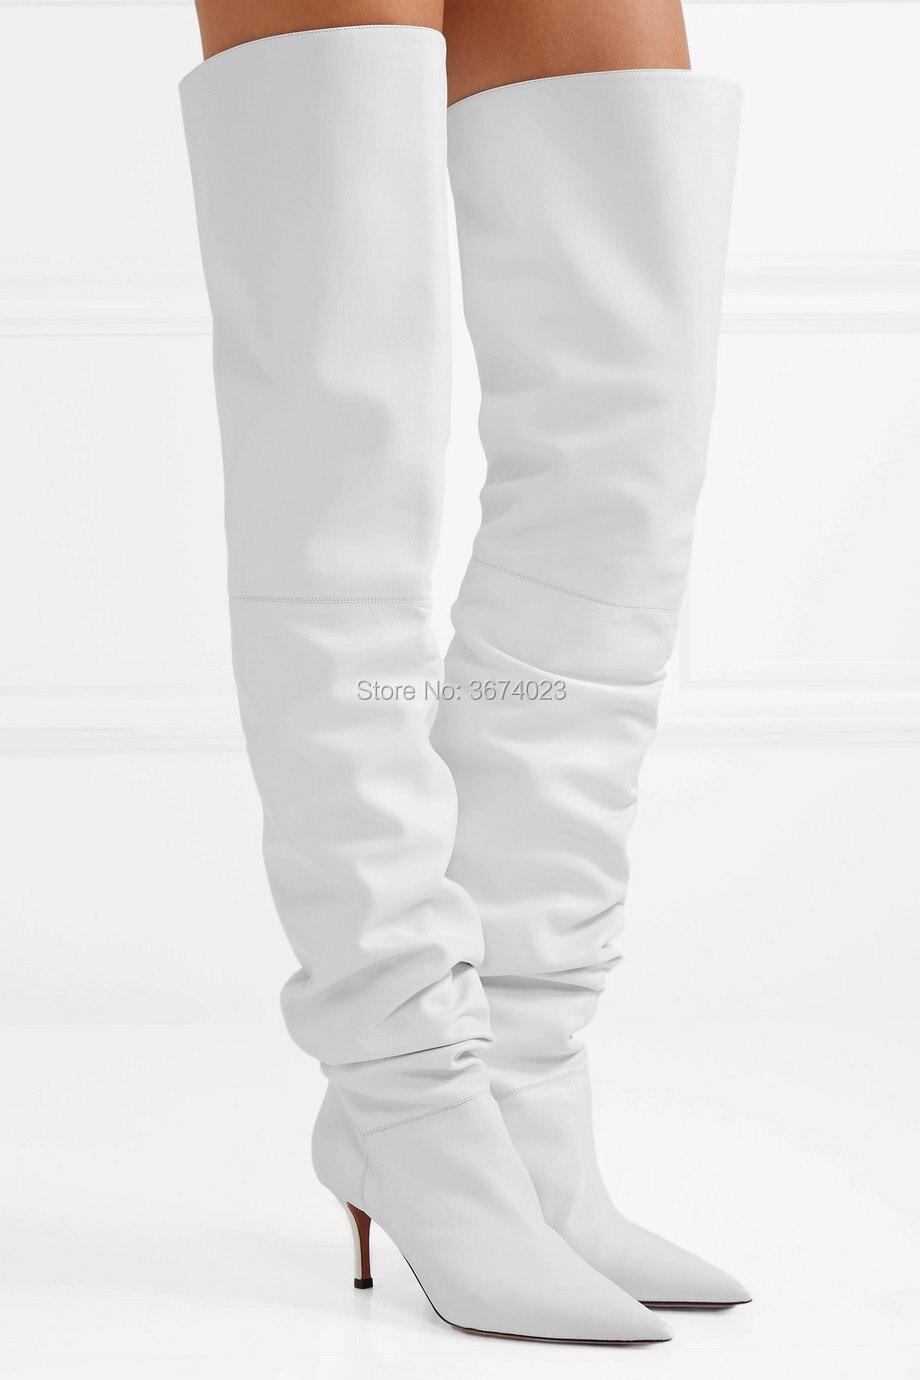 Qianruiti Women White Over Knee Boots